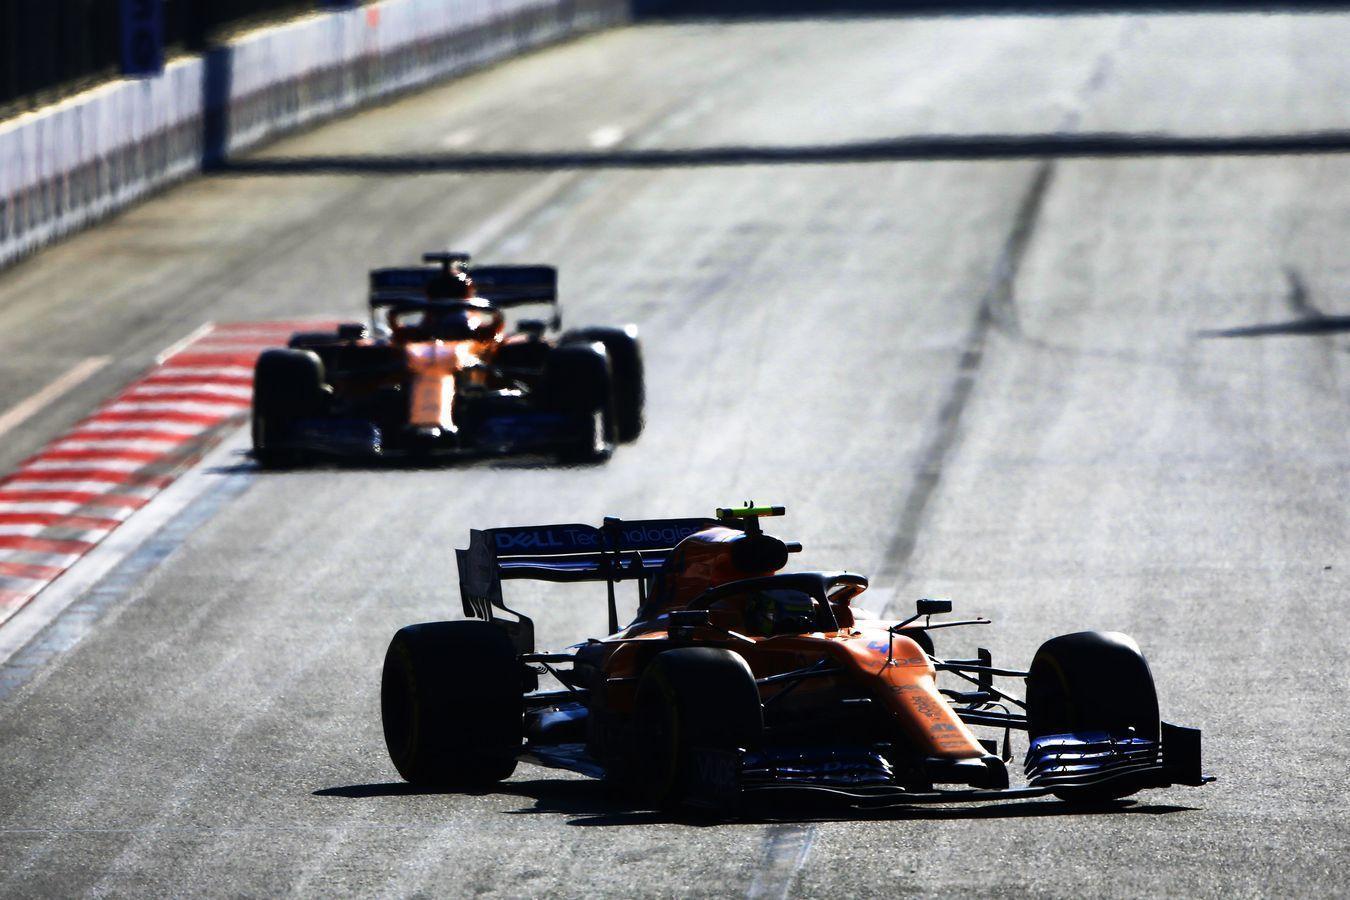 Lando Norris leads Carlos Sainz, McLaren